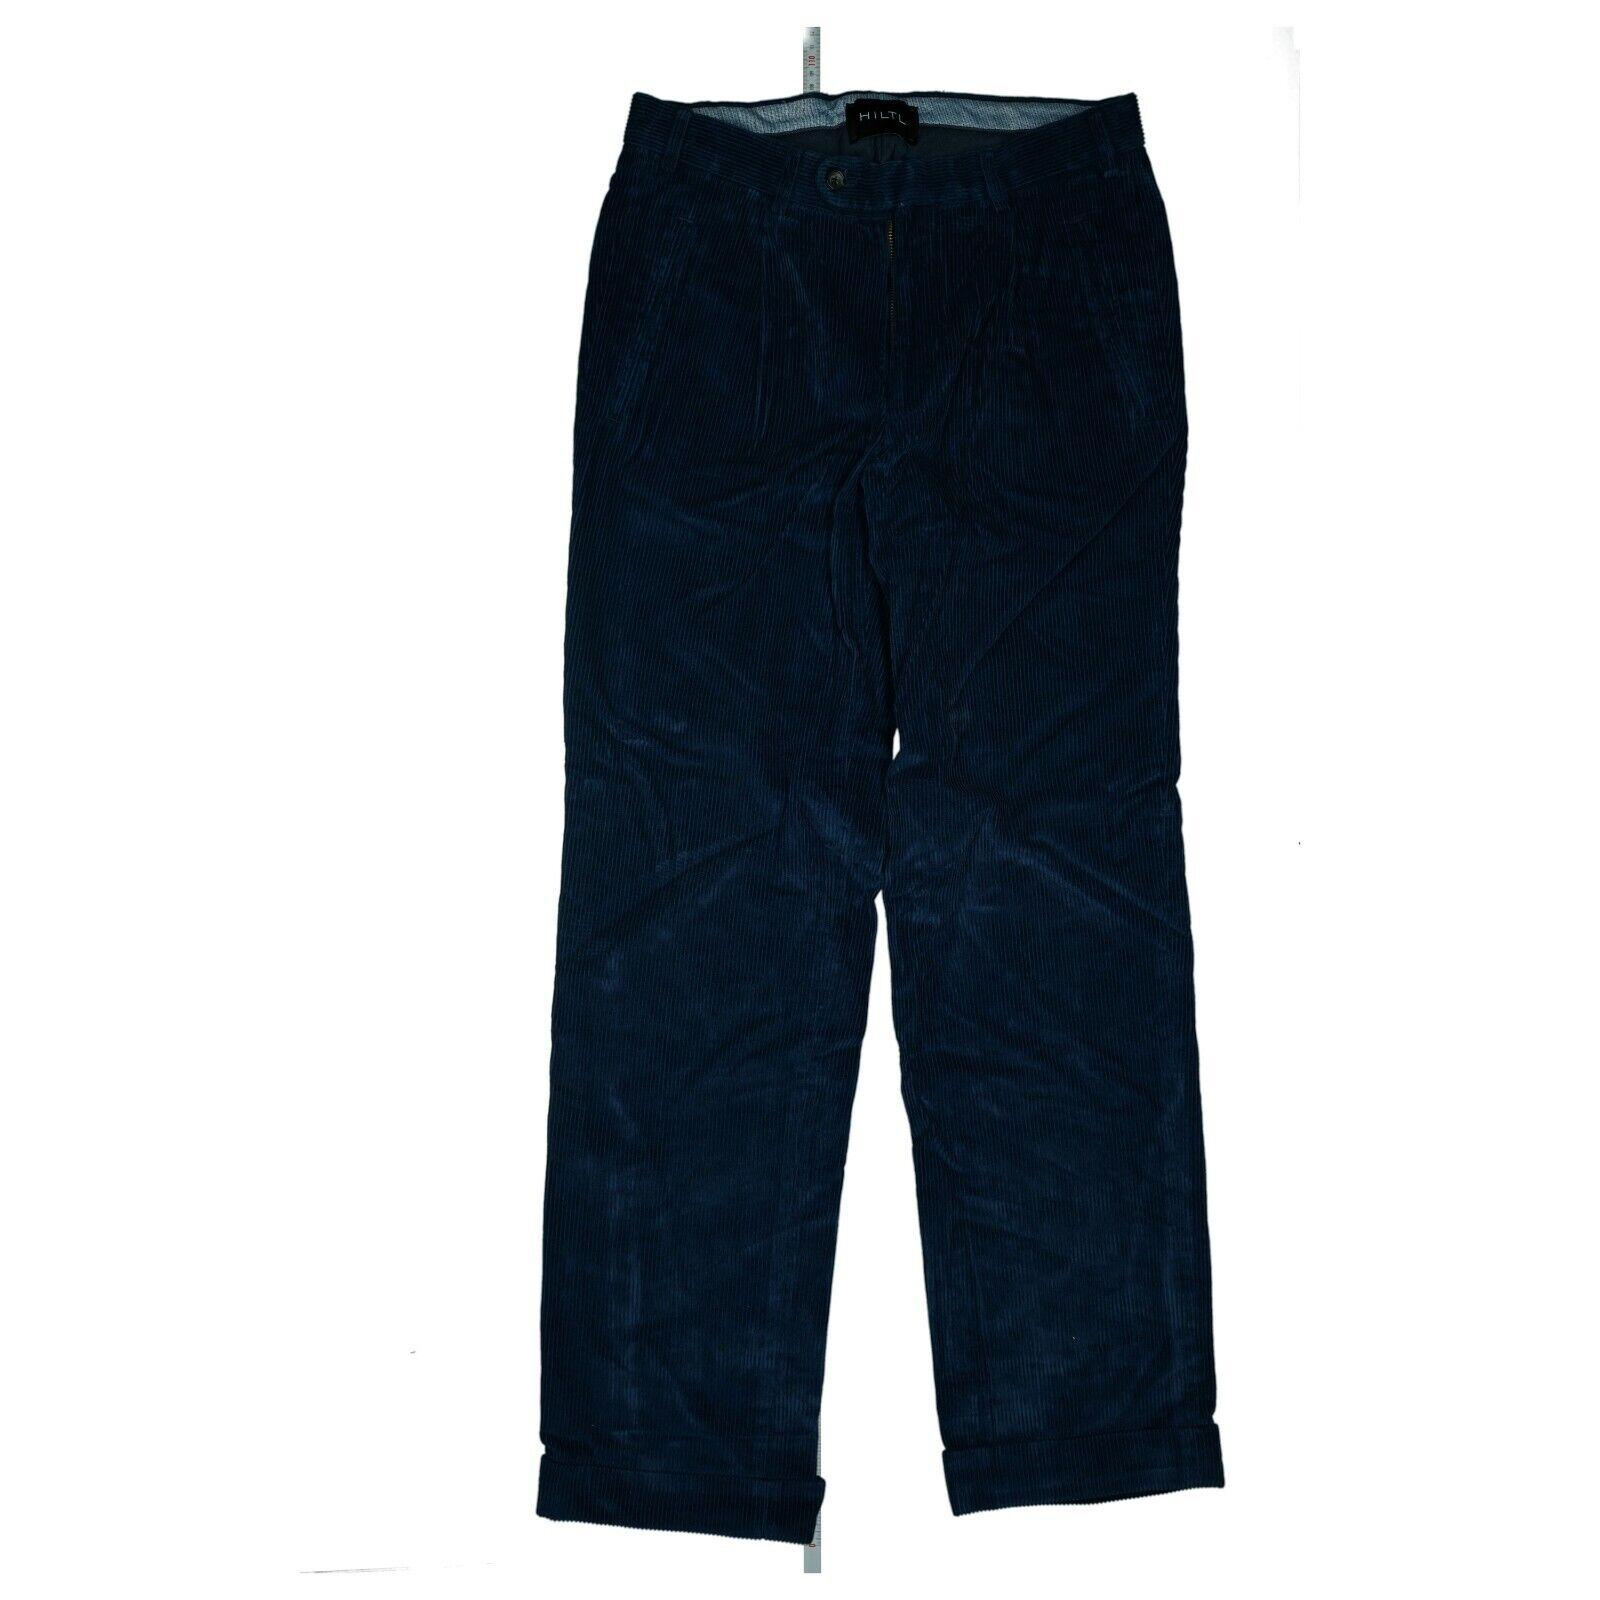 HILTL Herren Classic Fit Jeans Hose Cord Freizeit Gr. 46 W31 L32 dunkel Blau NEU